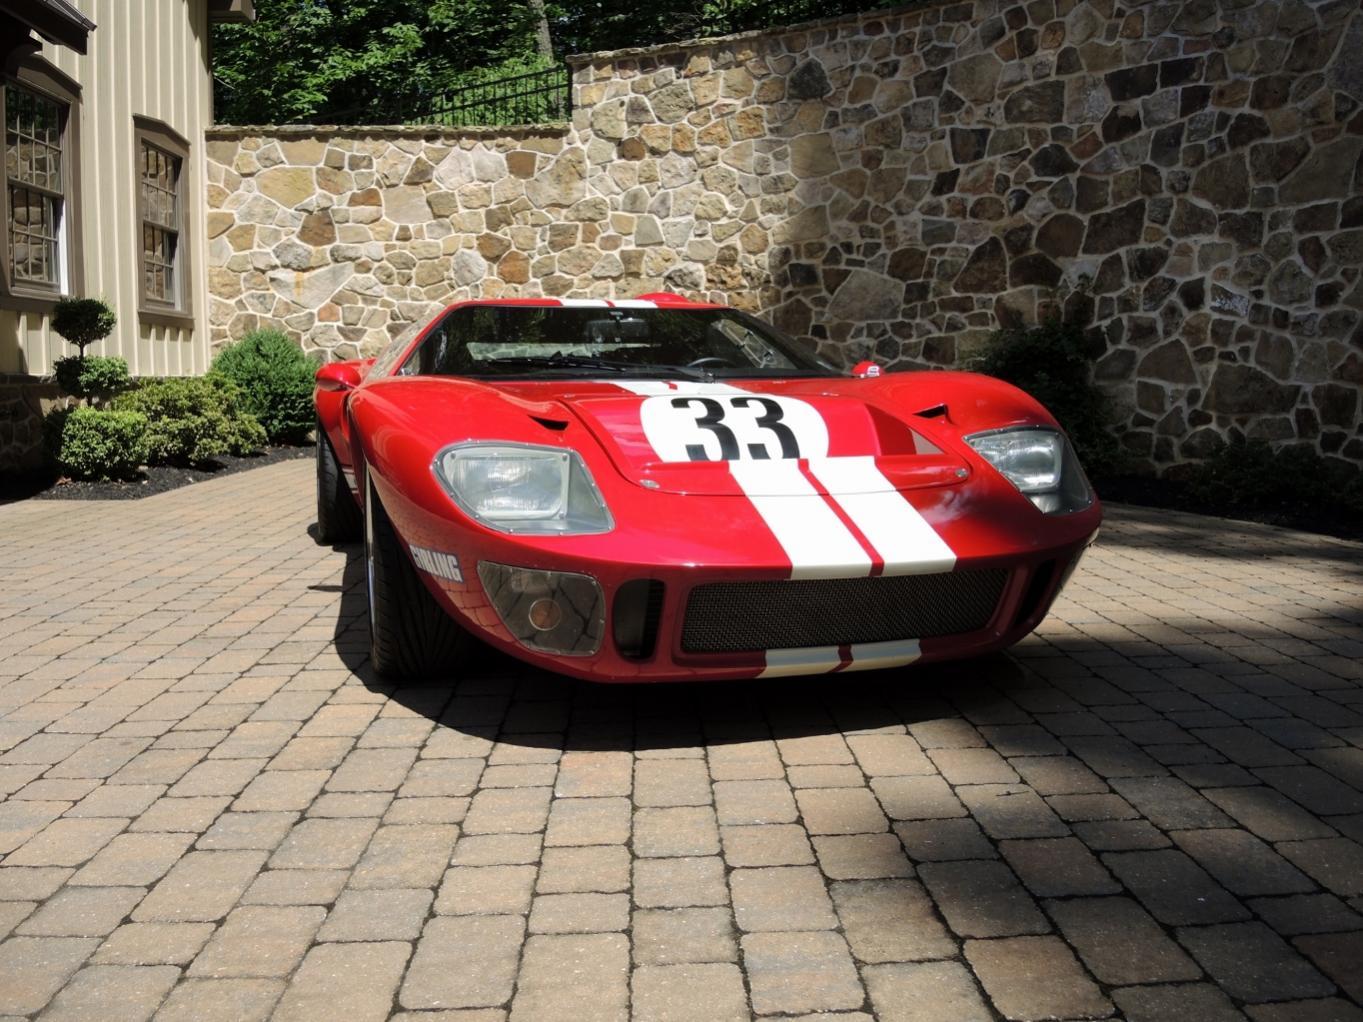 1966 CAV GT For Sale **SOLD**-front-c1-1920x1440-1364x1023-jpg